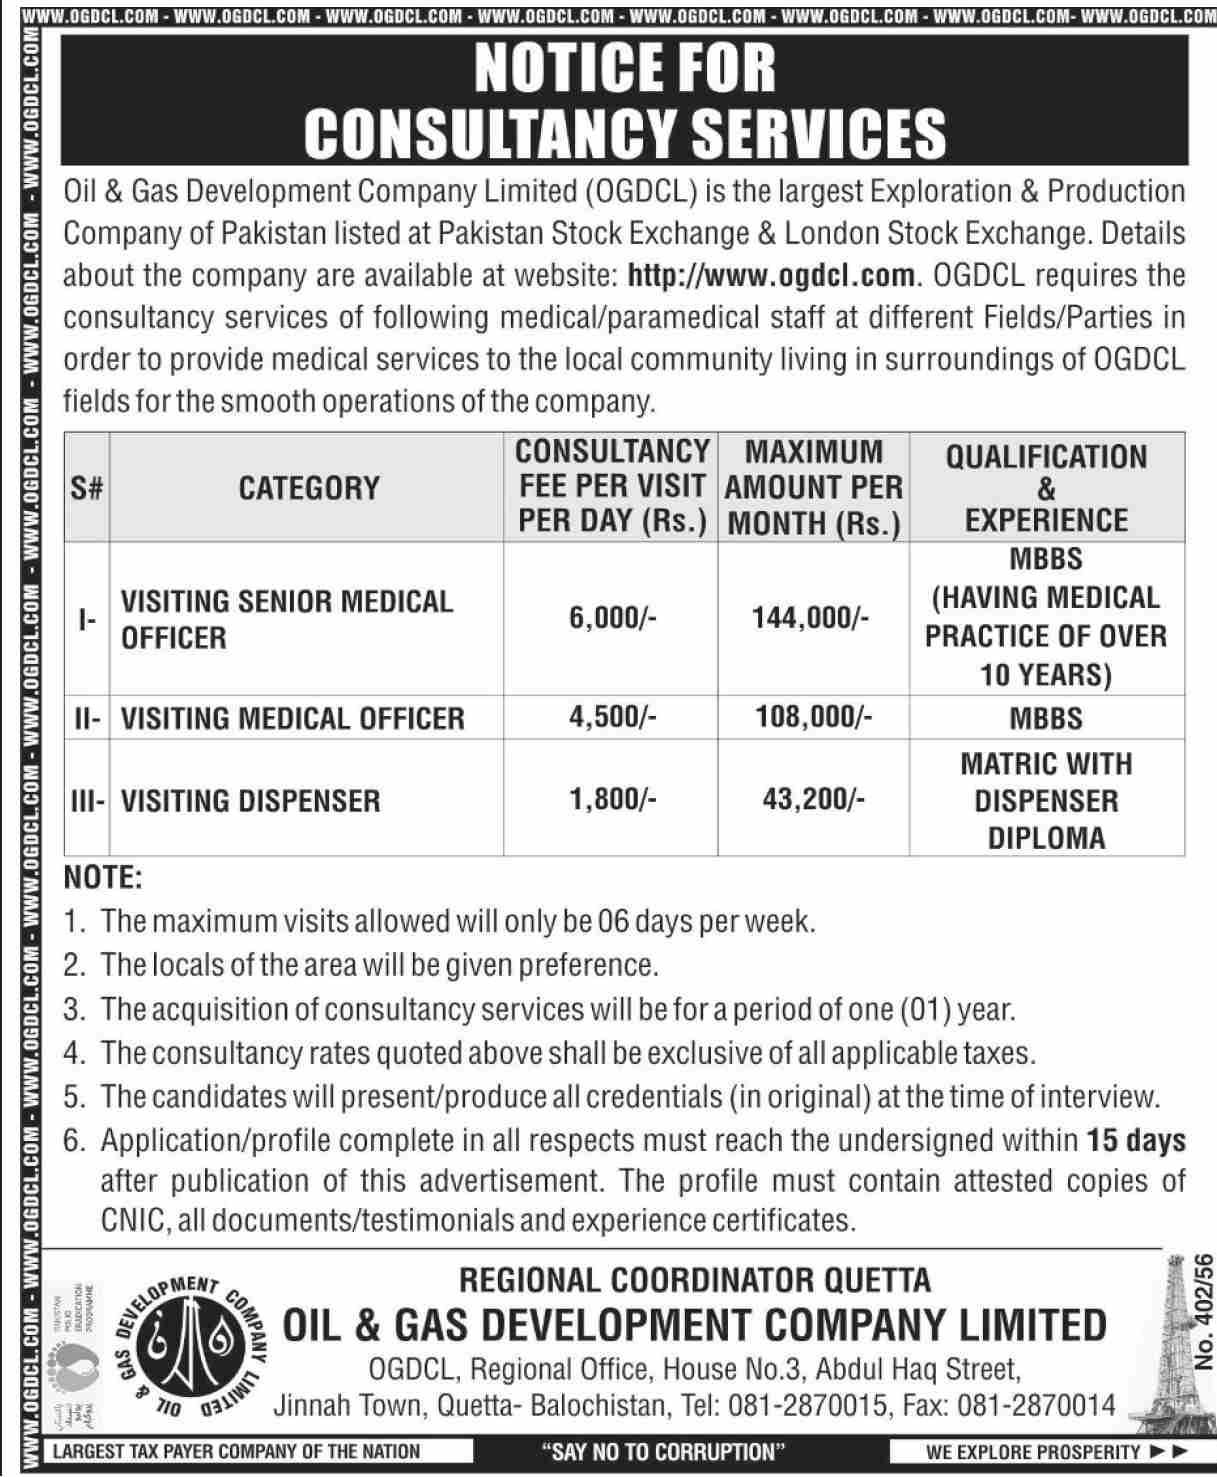 OGDCL Jobs 2021 in Quetta Balochistan, Oil & Gas Development Company